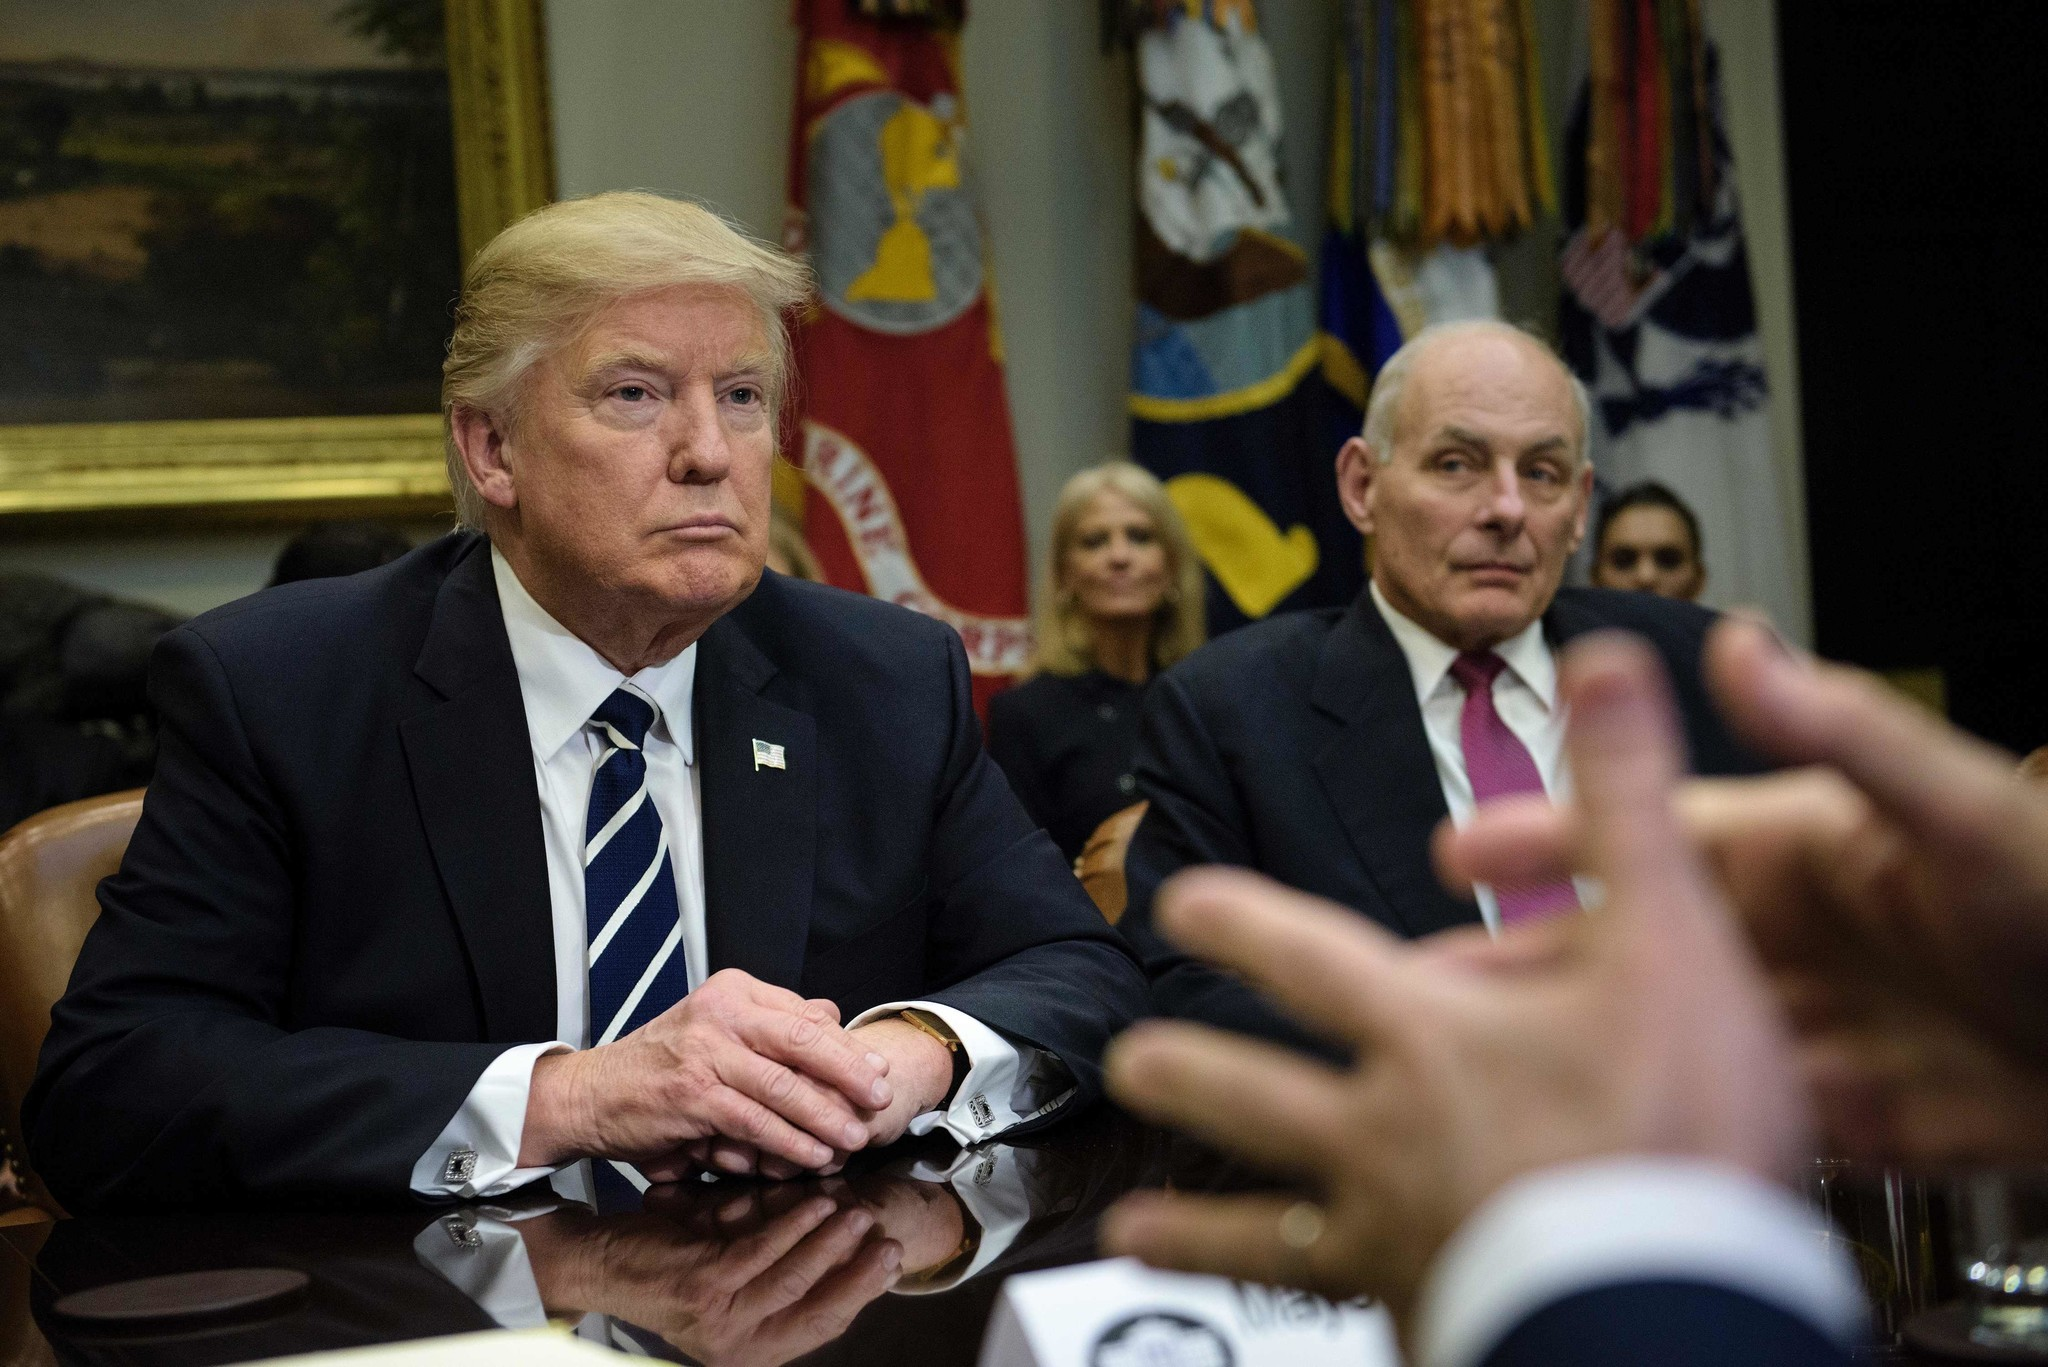 Trump travel ban could hurt medical visits to U.S.